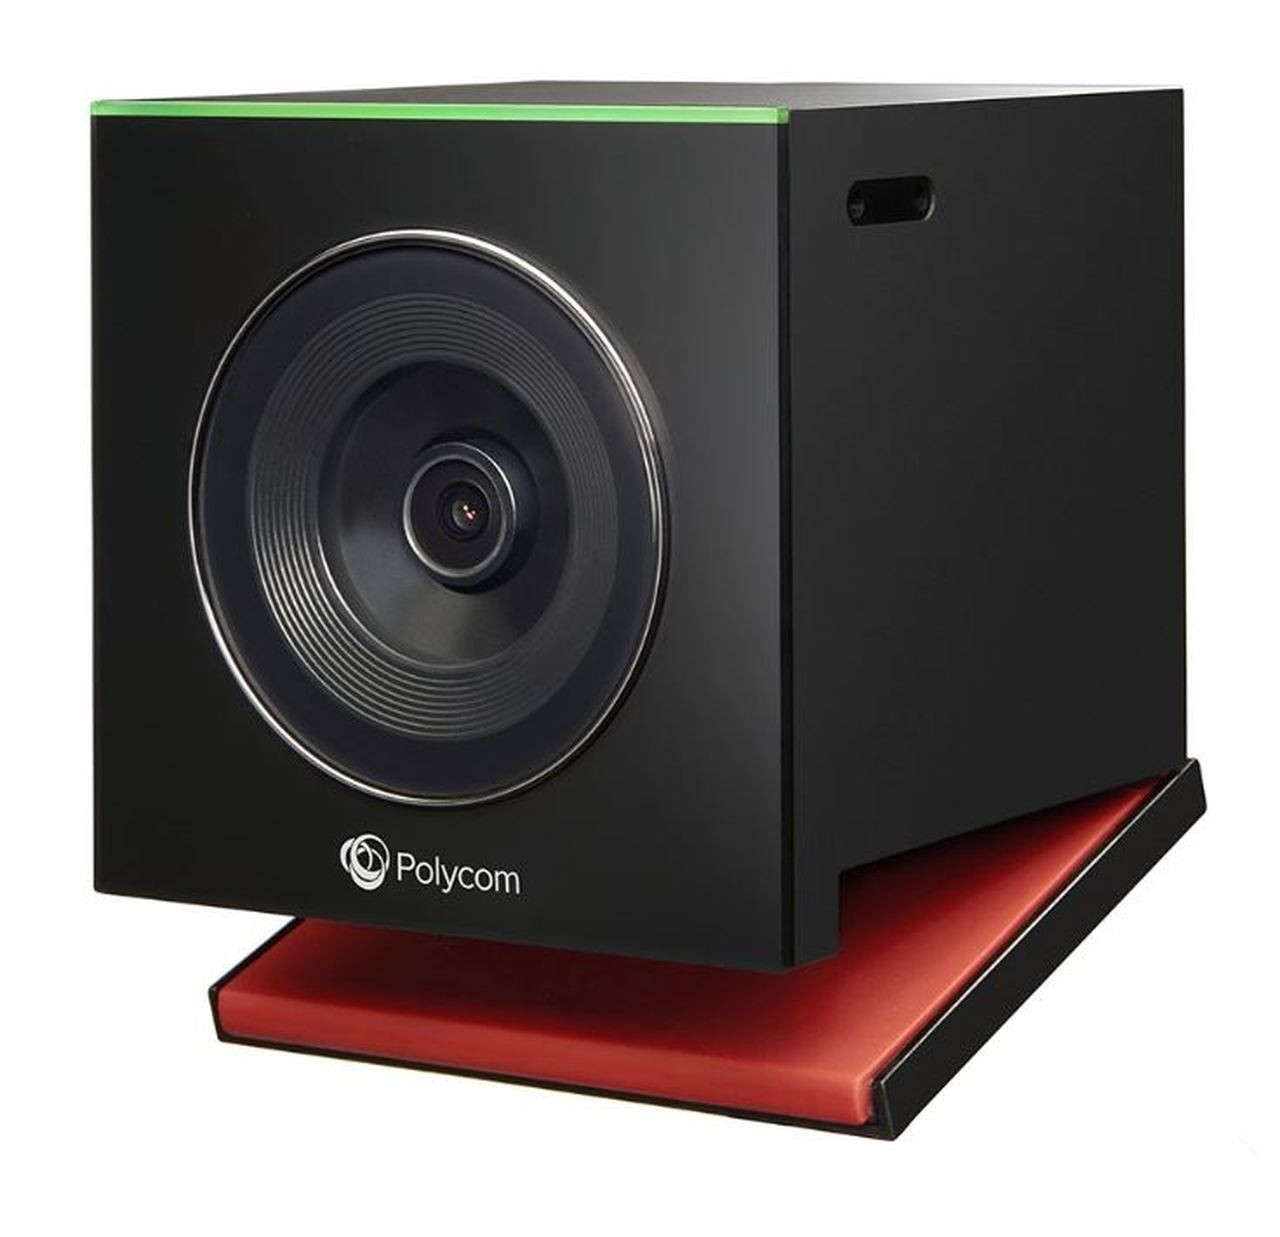 Polycom Eagleeye Cube Hdci 4K Conferencing Camera 2200-61960-001